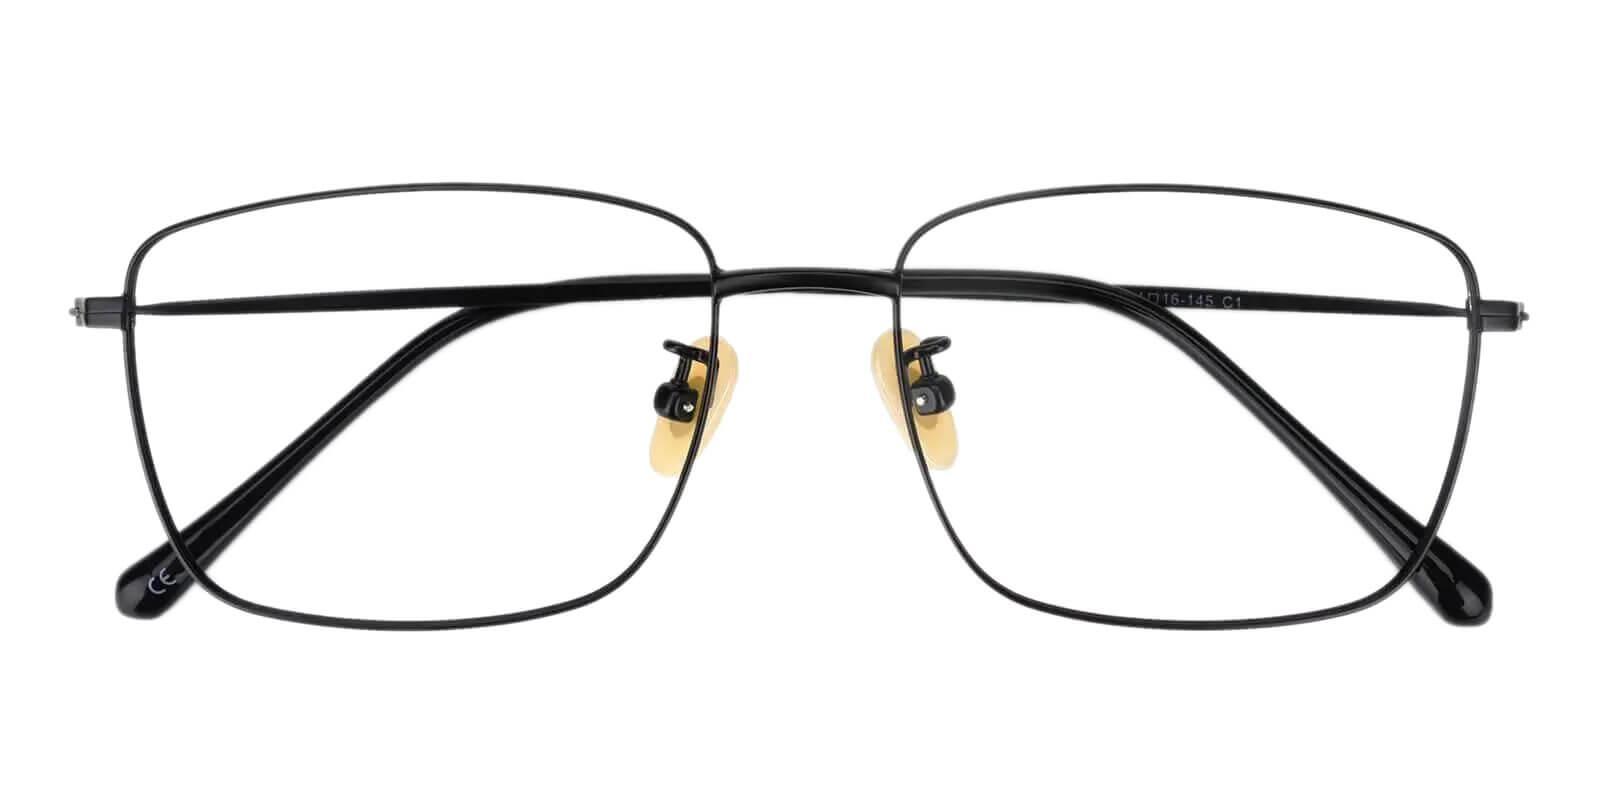 Morocco Black Titanium Lightweight , NosePads , Eyeglasses Frames from ABBE Glasses